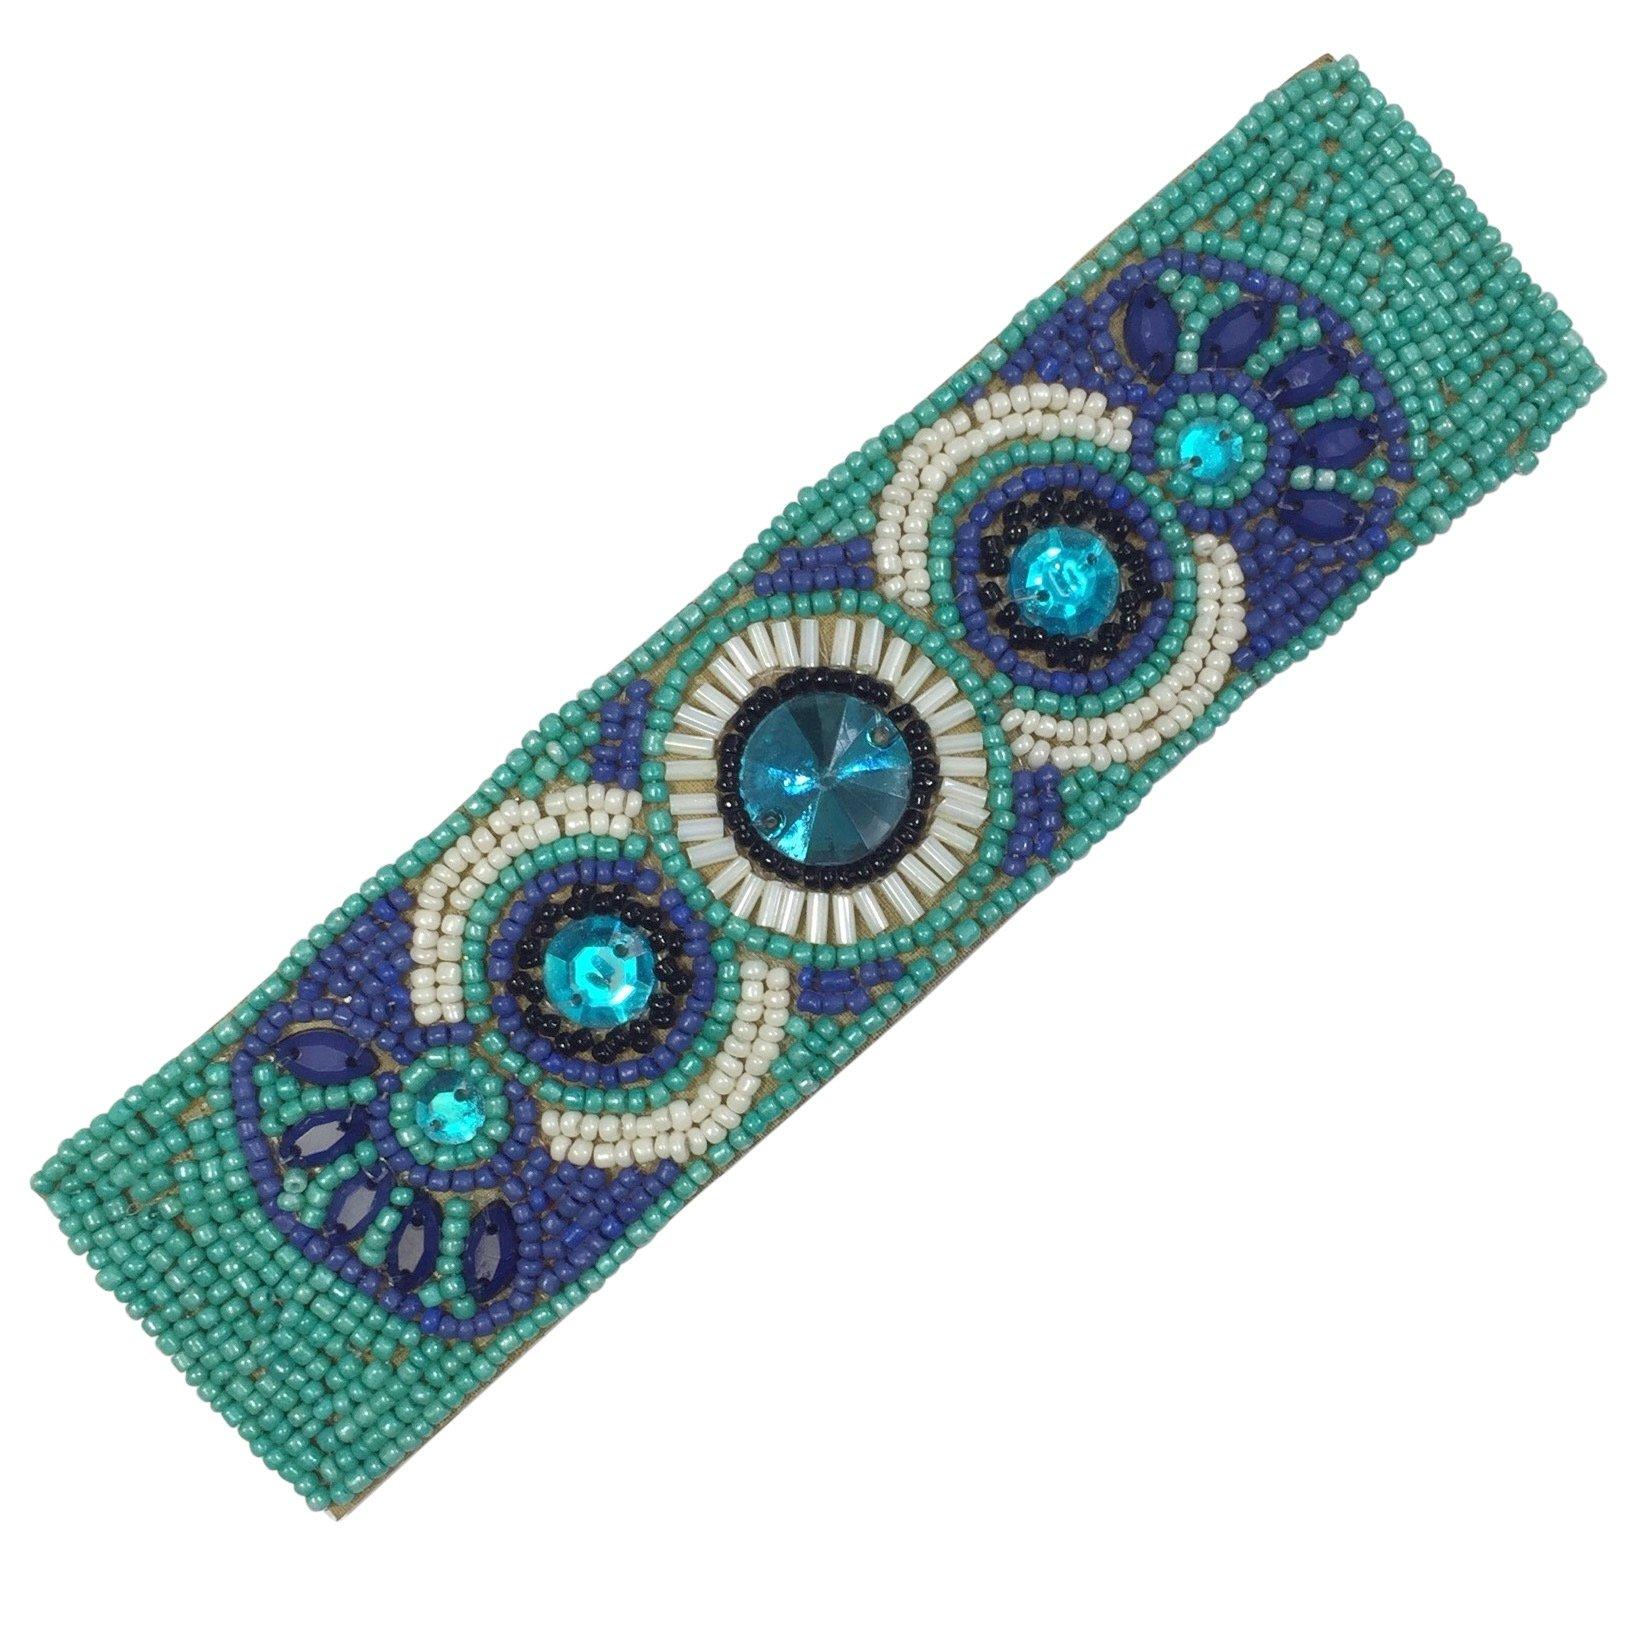 Gypsy Jewels Bohemian Beaded Multi Color Statement Wired Adjustable Cuff Bracelet (Royal & Aqua Blue)